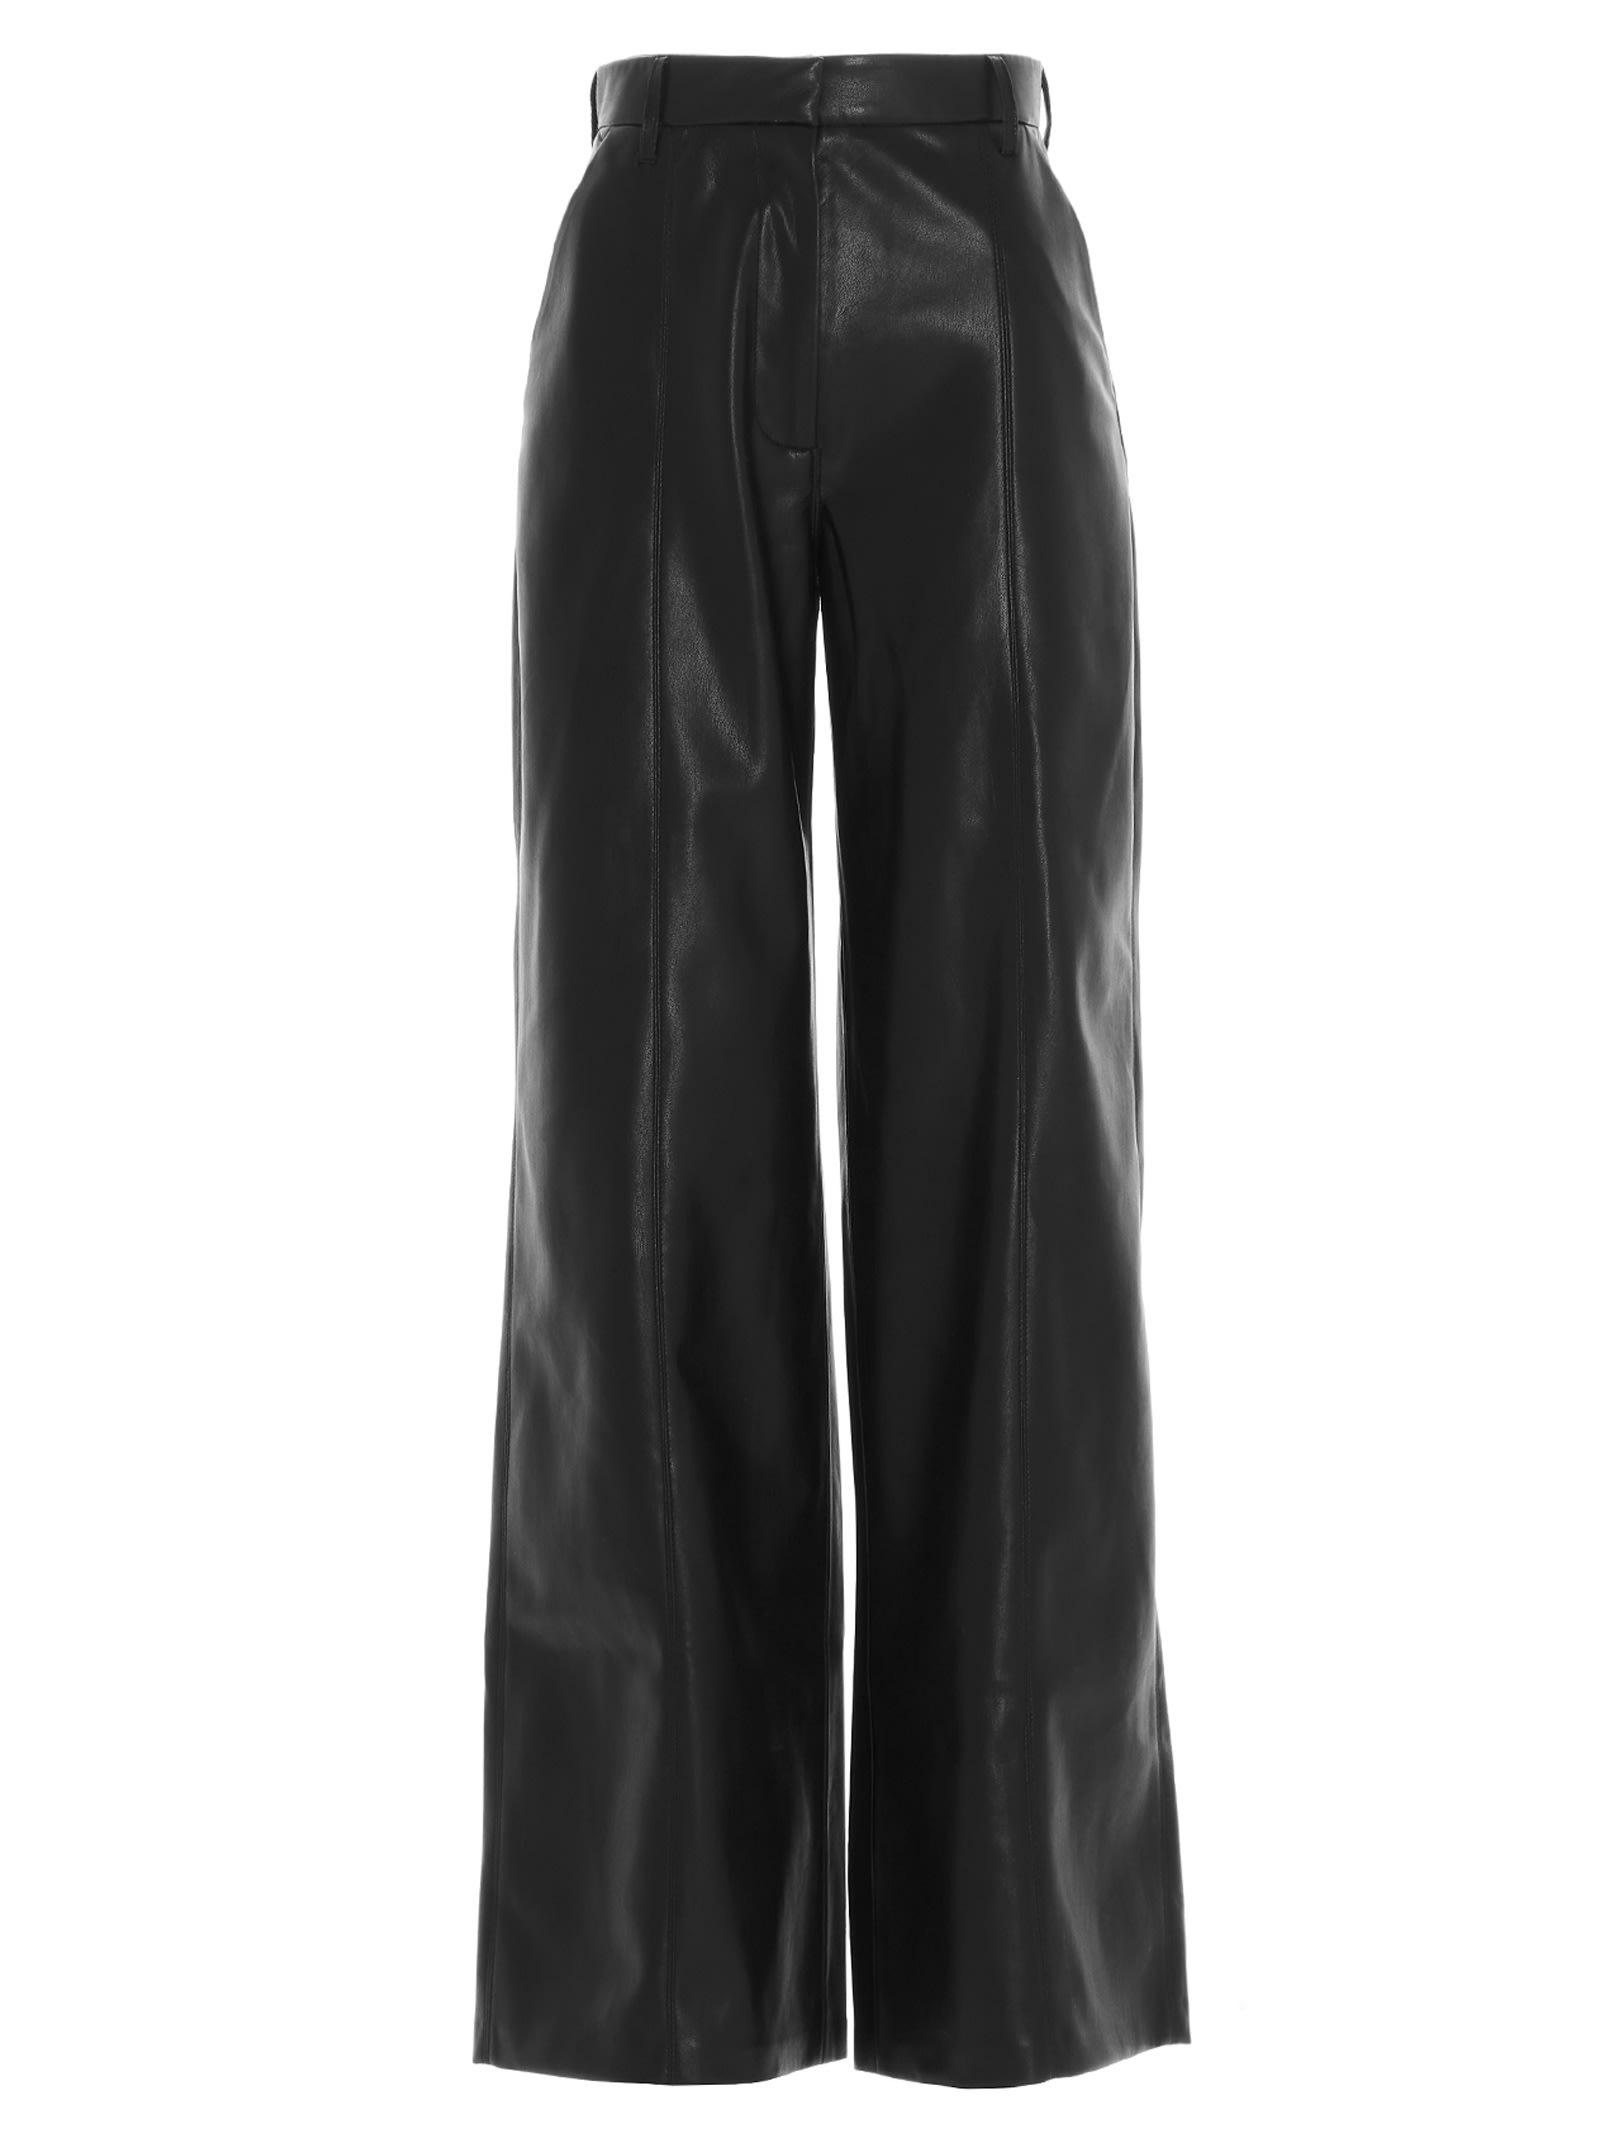 Nanushka cleo Pants